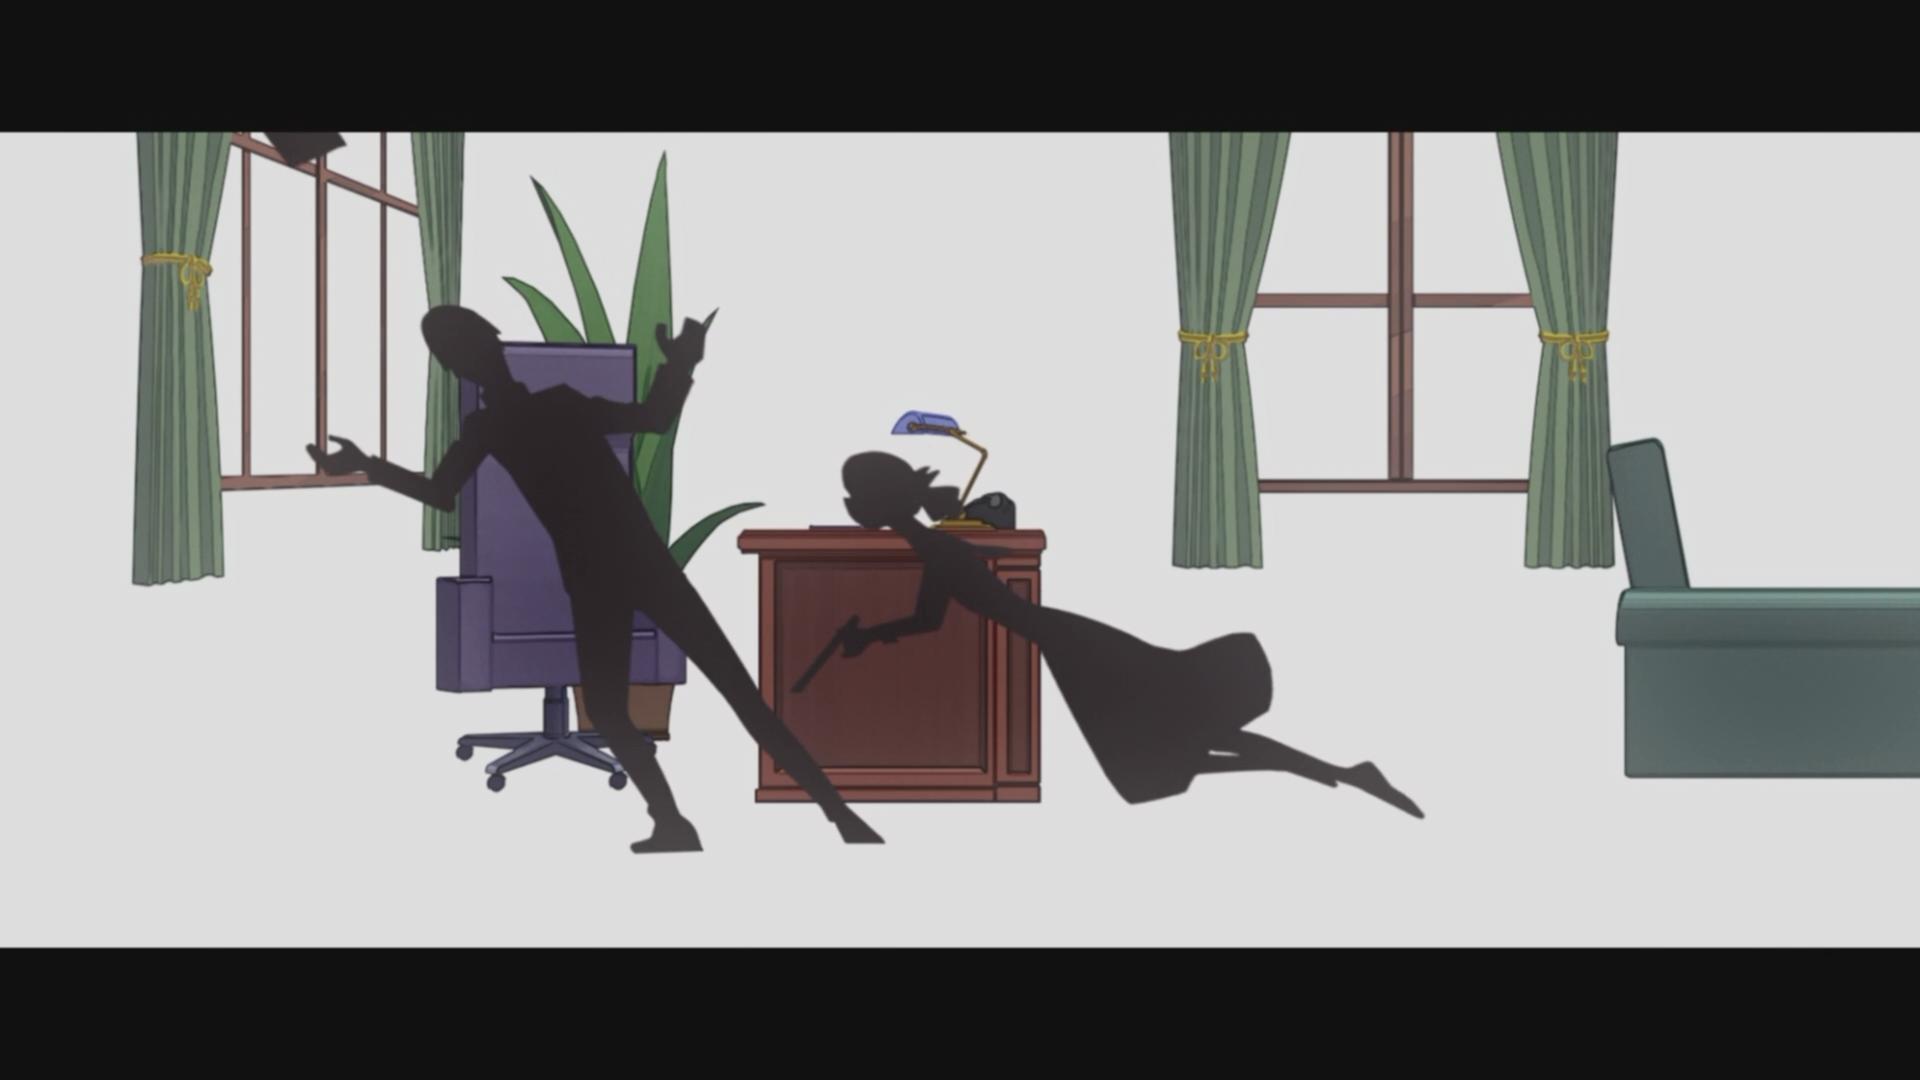 Kaguya-sama-wa-Kokurasetai-S2-07-000405-sazae-san-parody